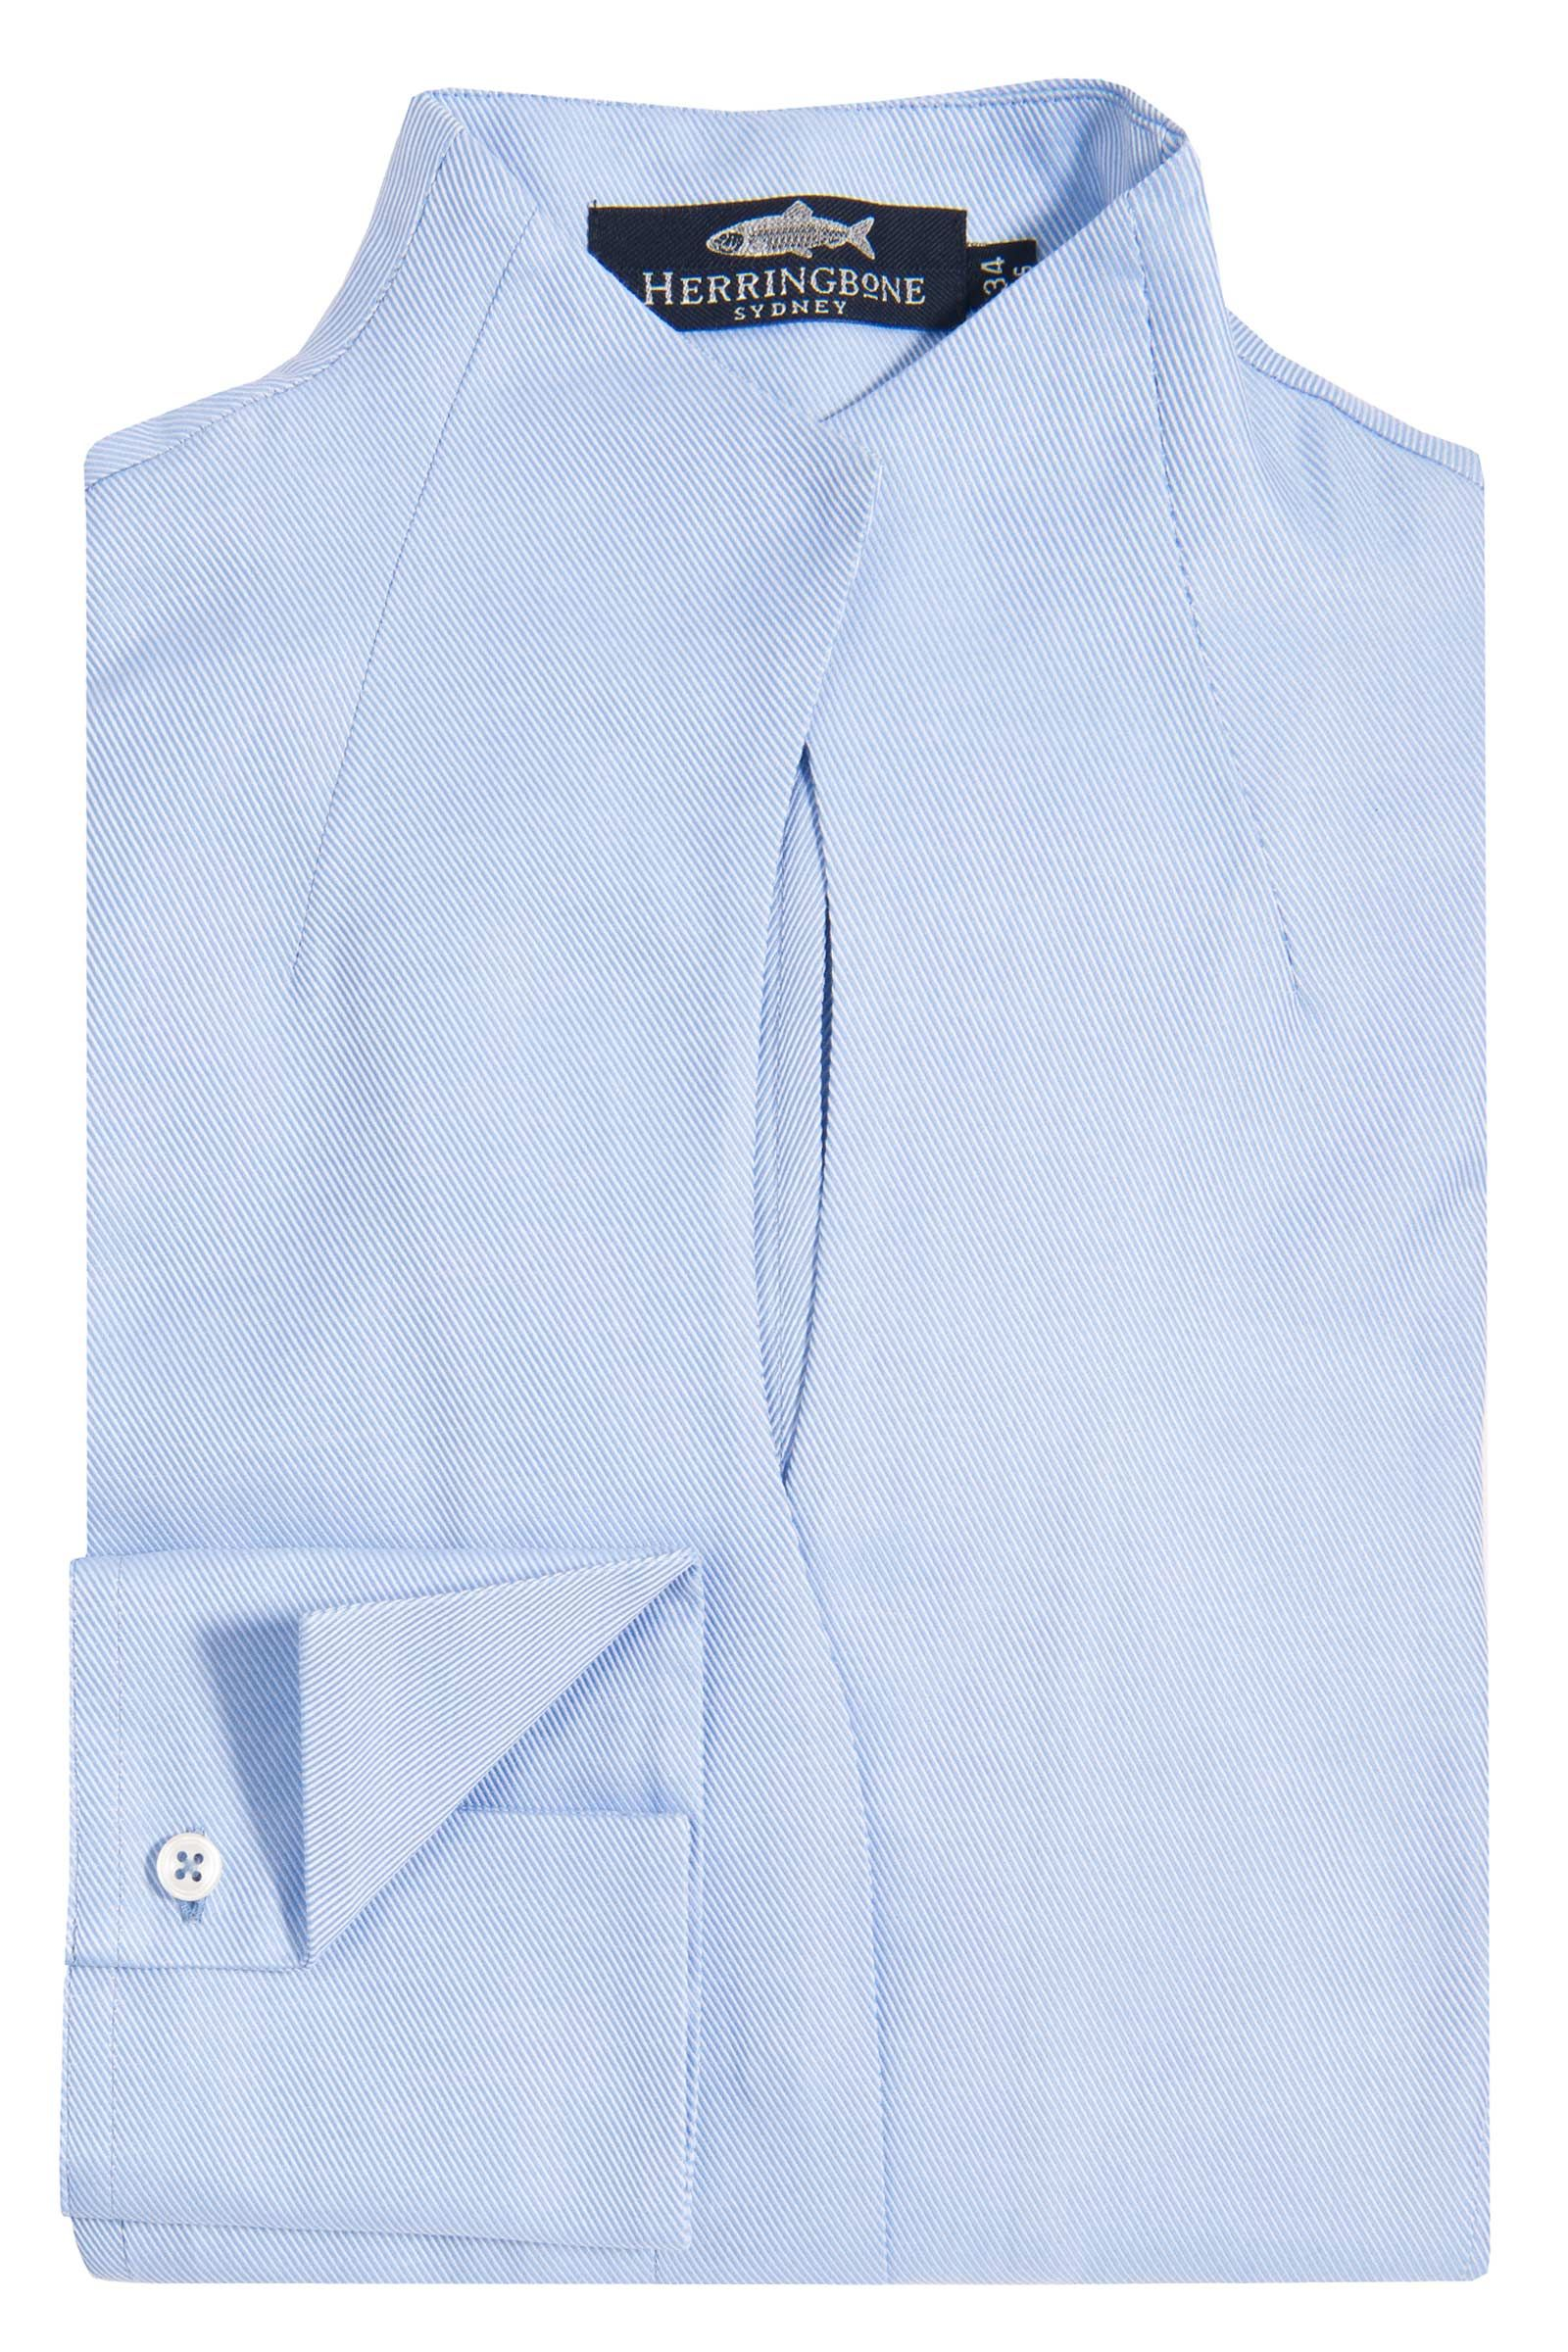 Peekaboo Shirt I Style I Chic I Womenswear I Luxury I Herringbone I Sydney I AUD$199